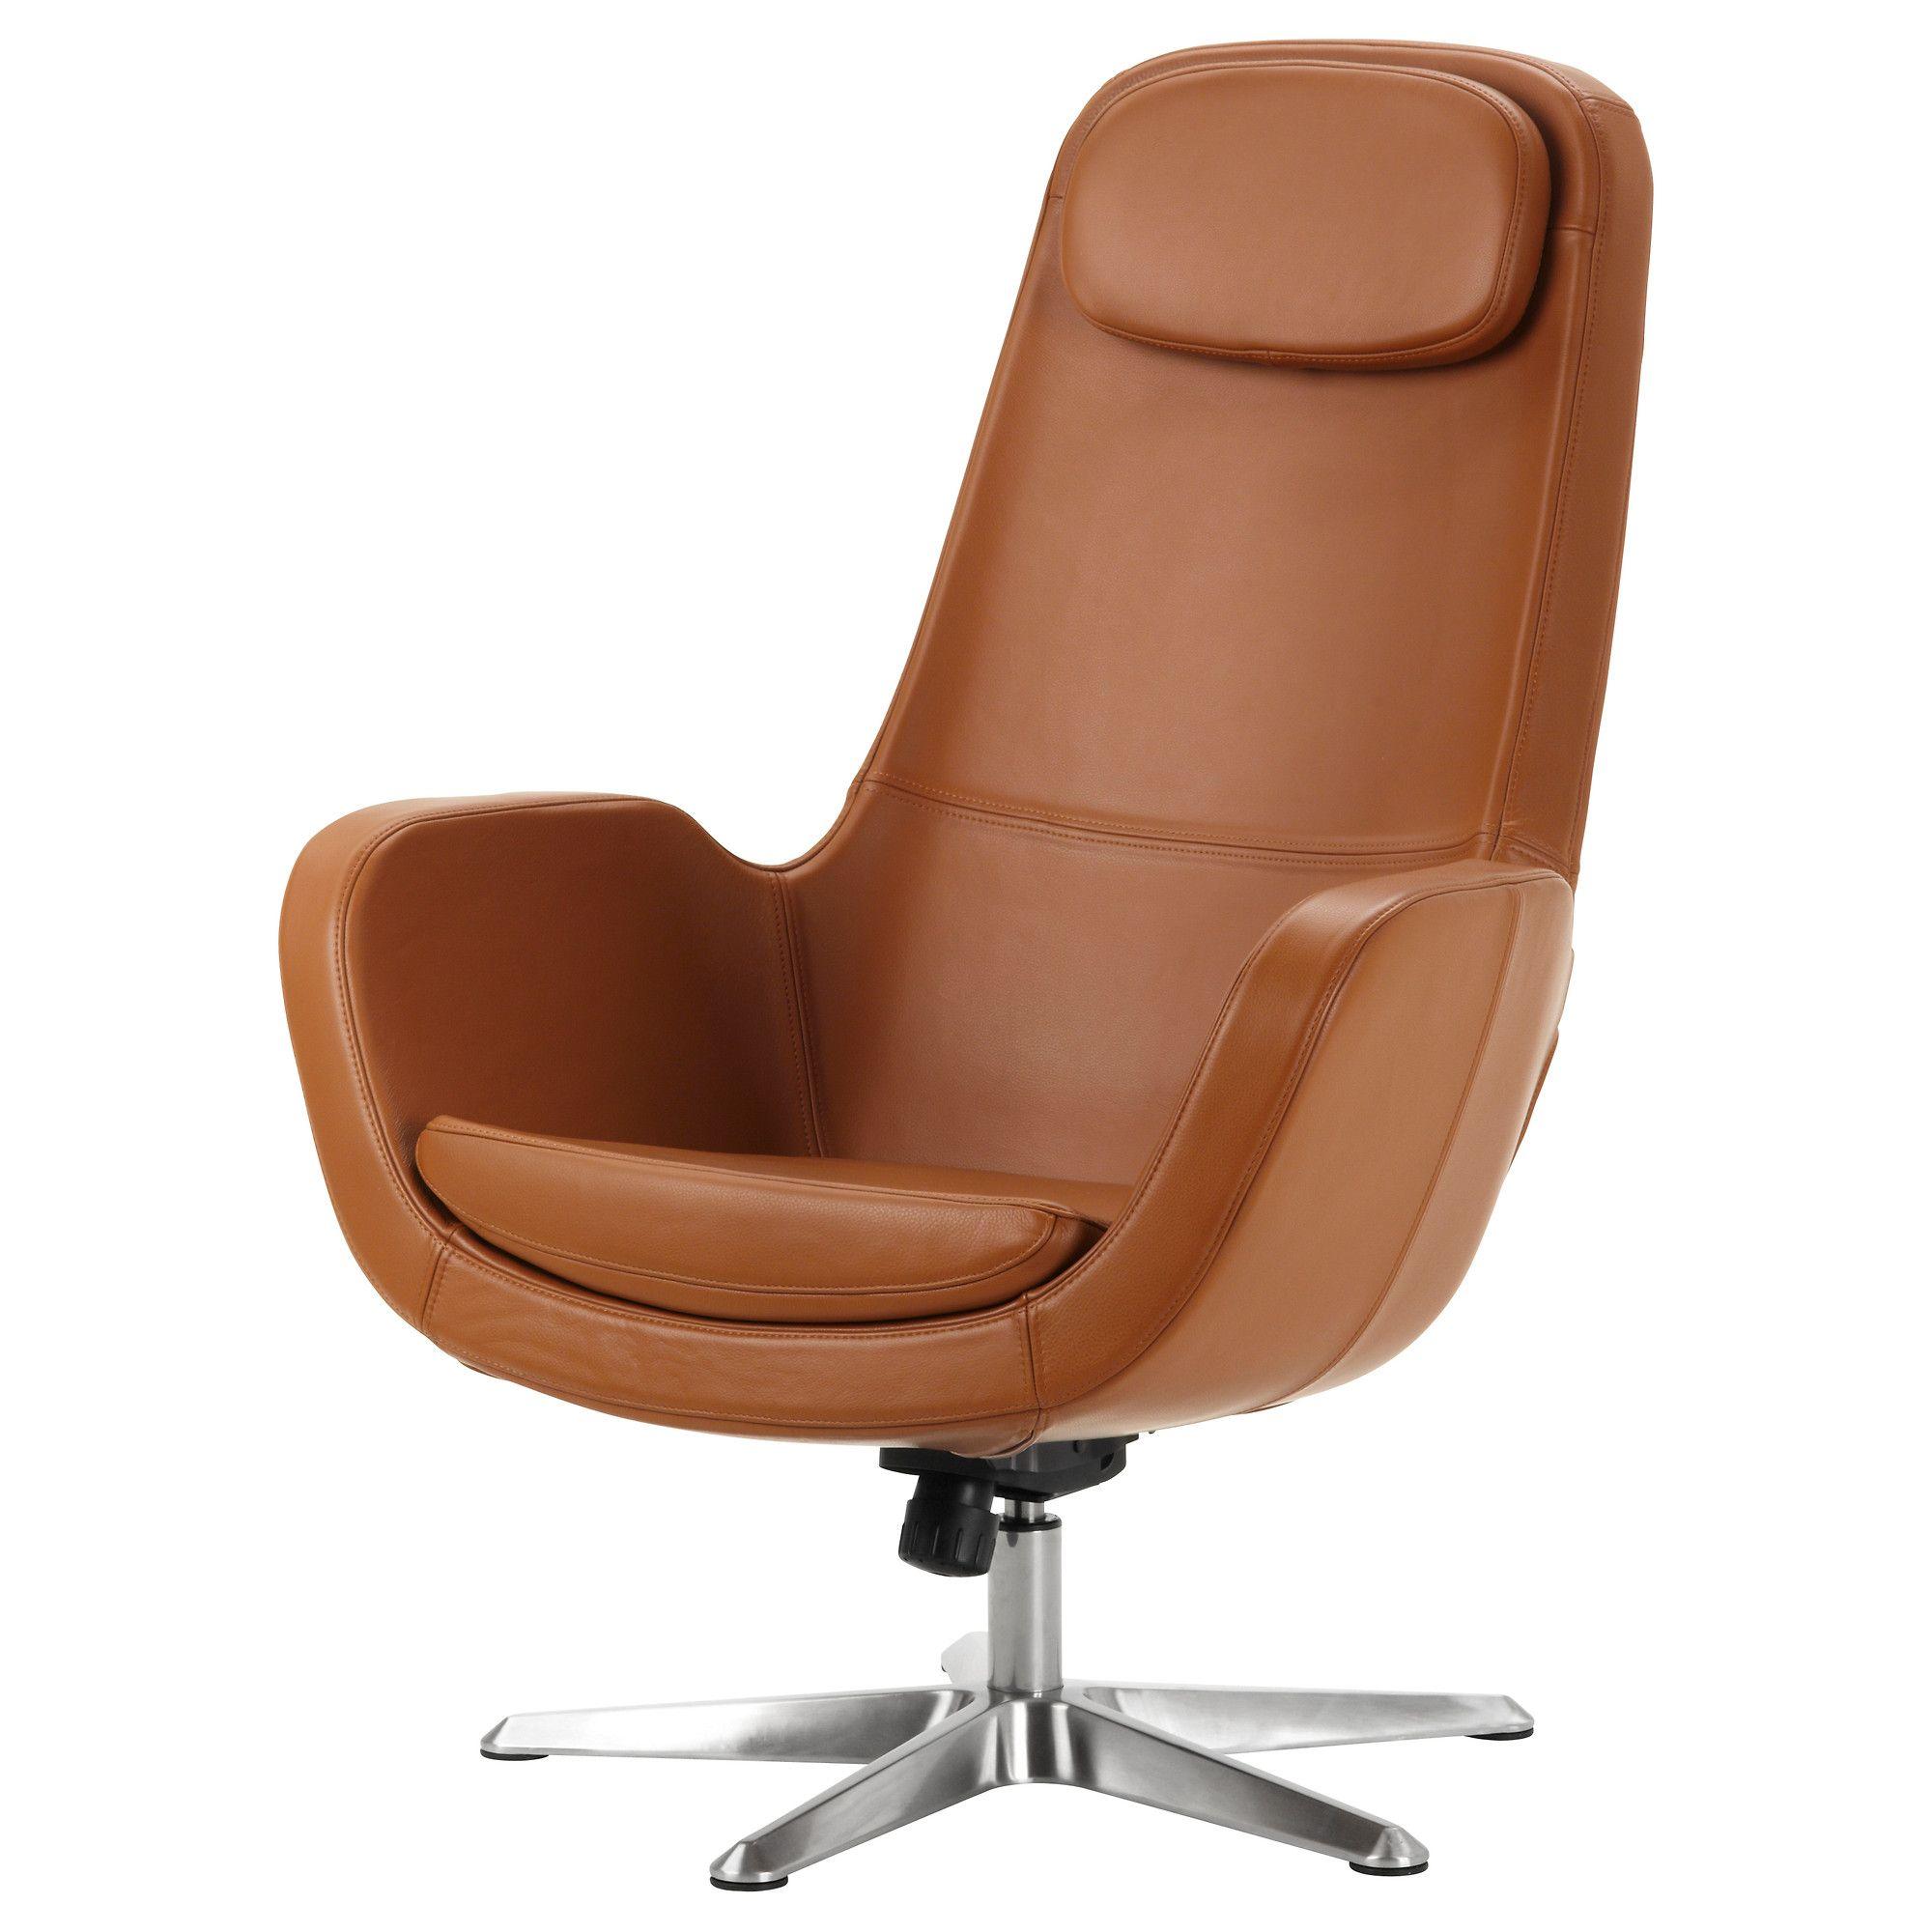 Furniture And Home Furnishings Ikea Armchair Swivel Chair